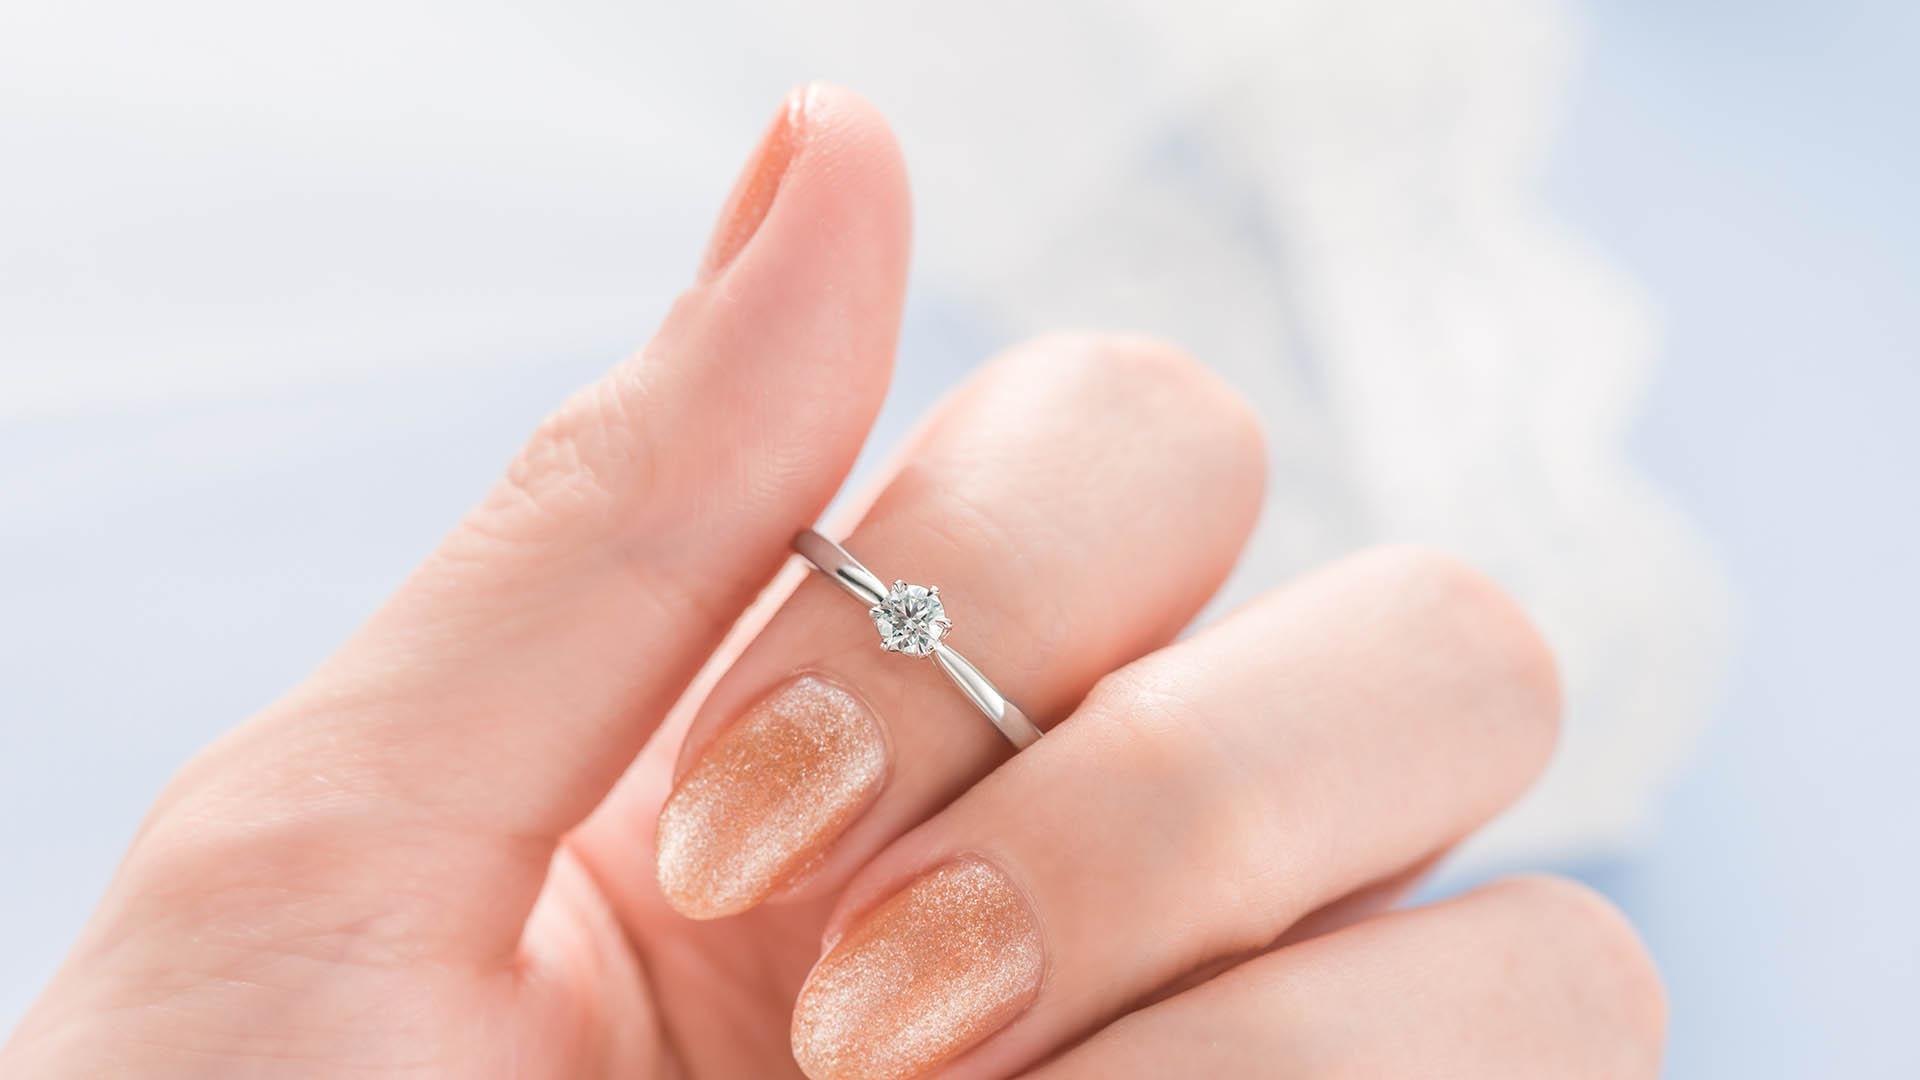 helia ヘリア | 婚約指輪サムネイル 4